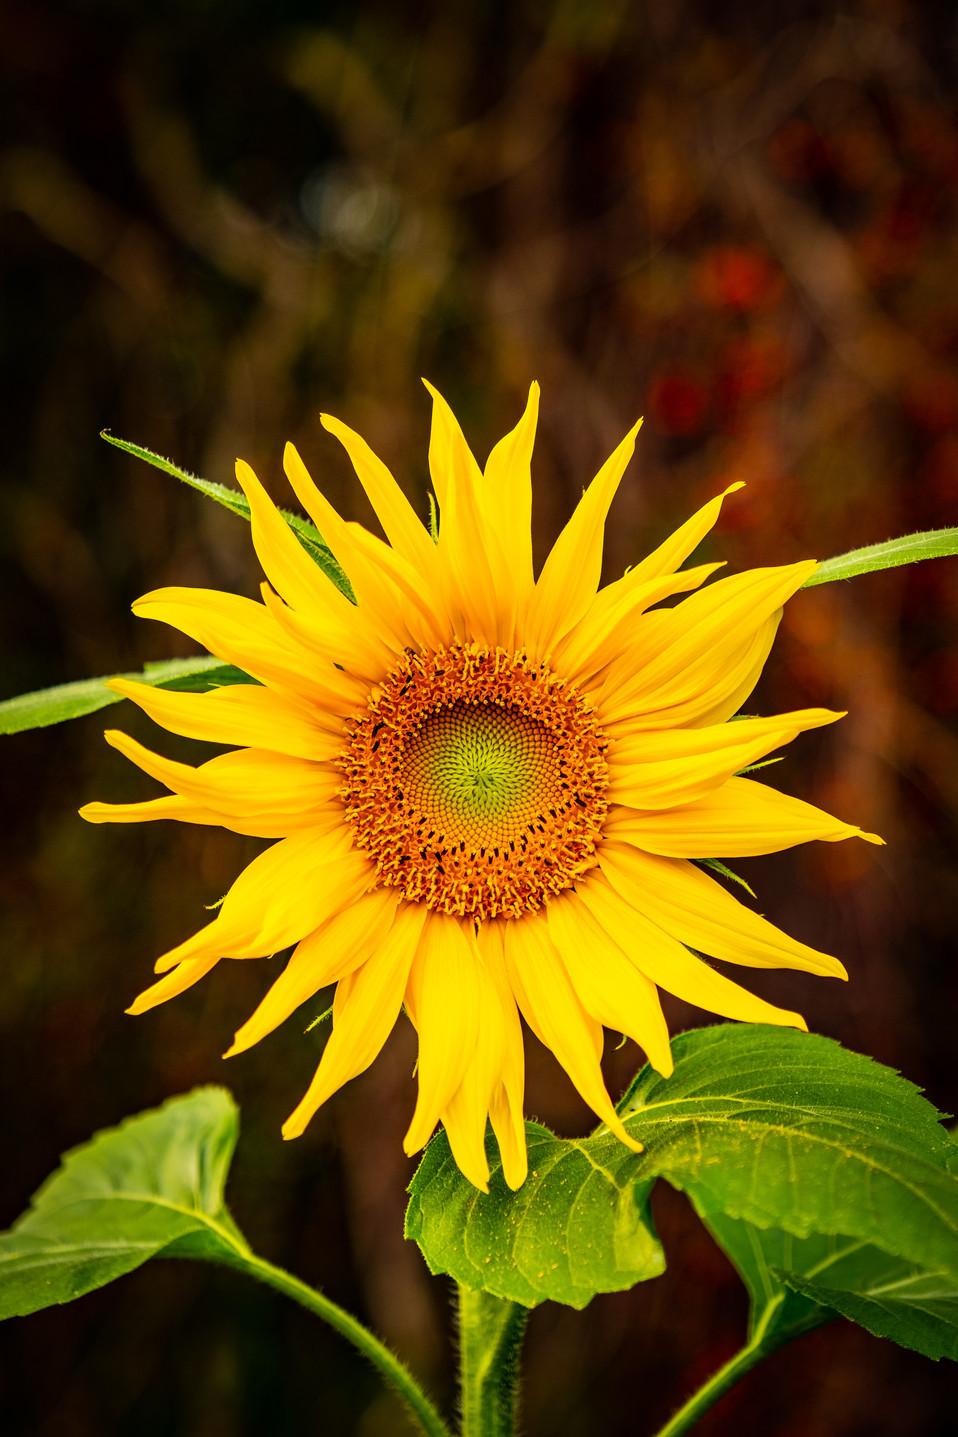 Sunflowers-2.jpg